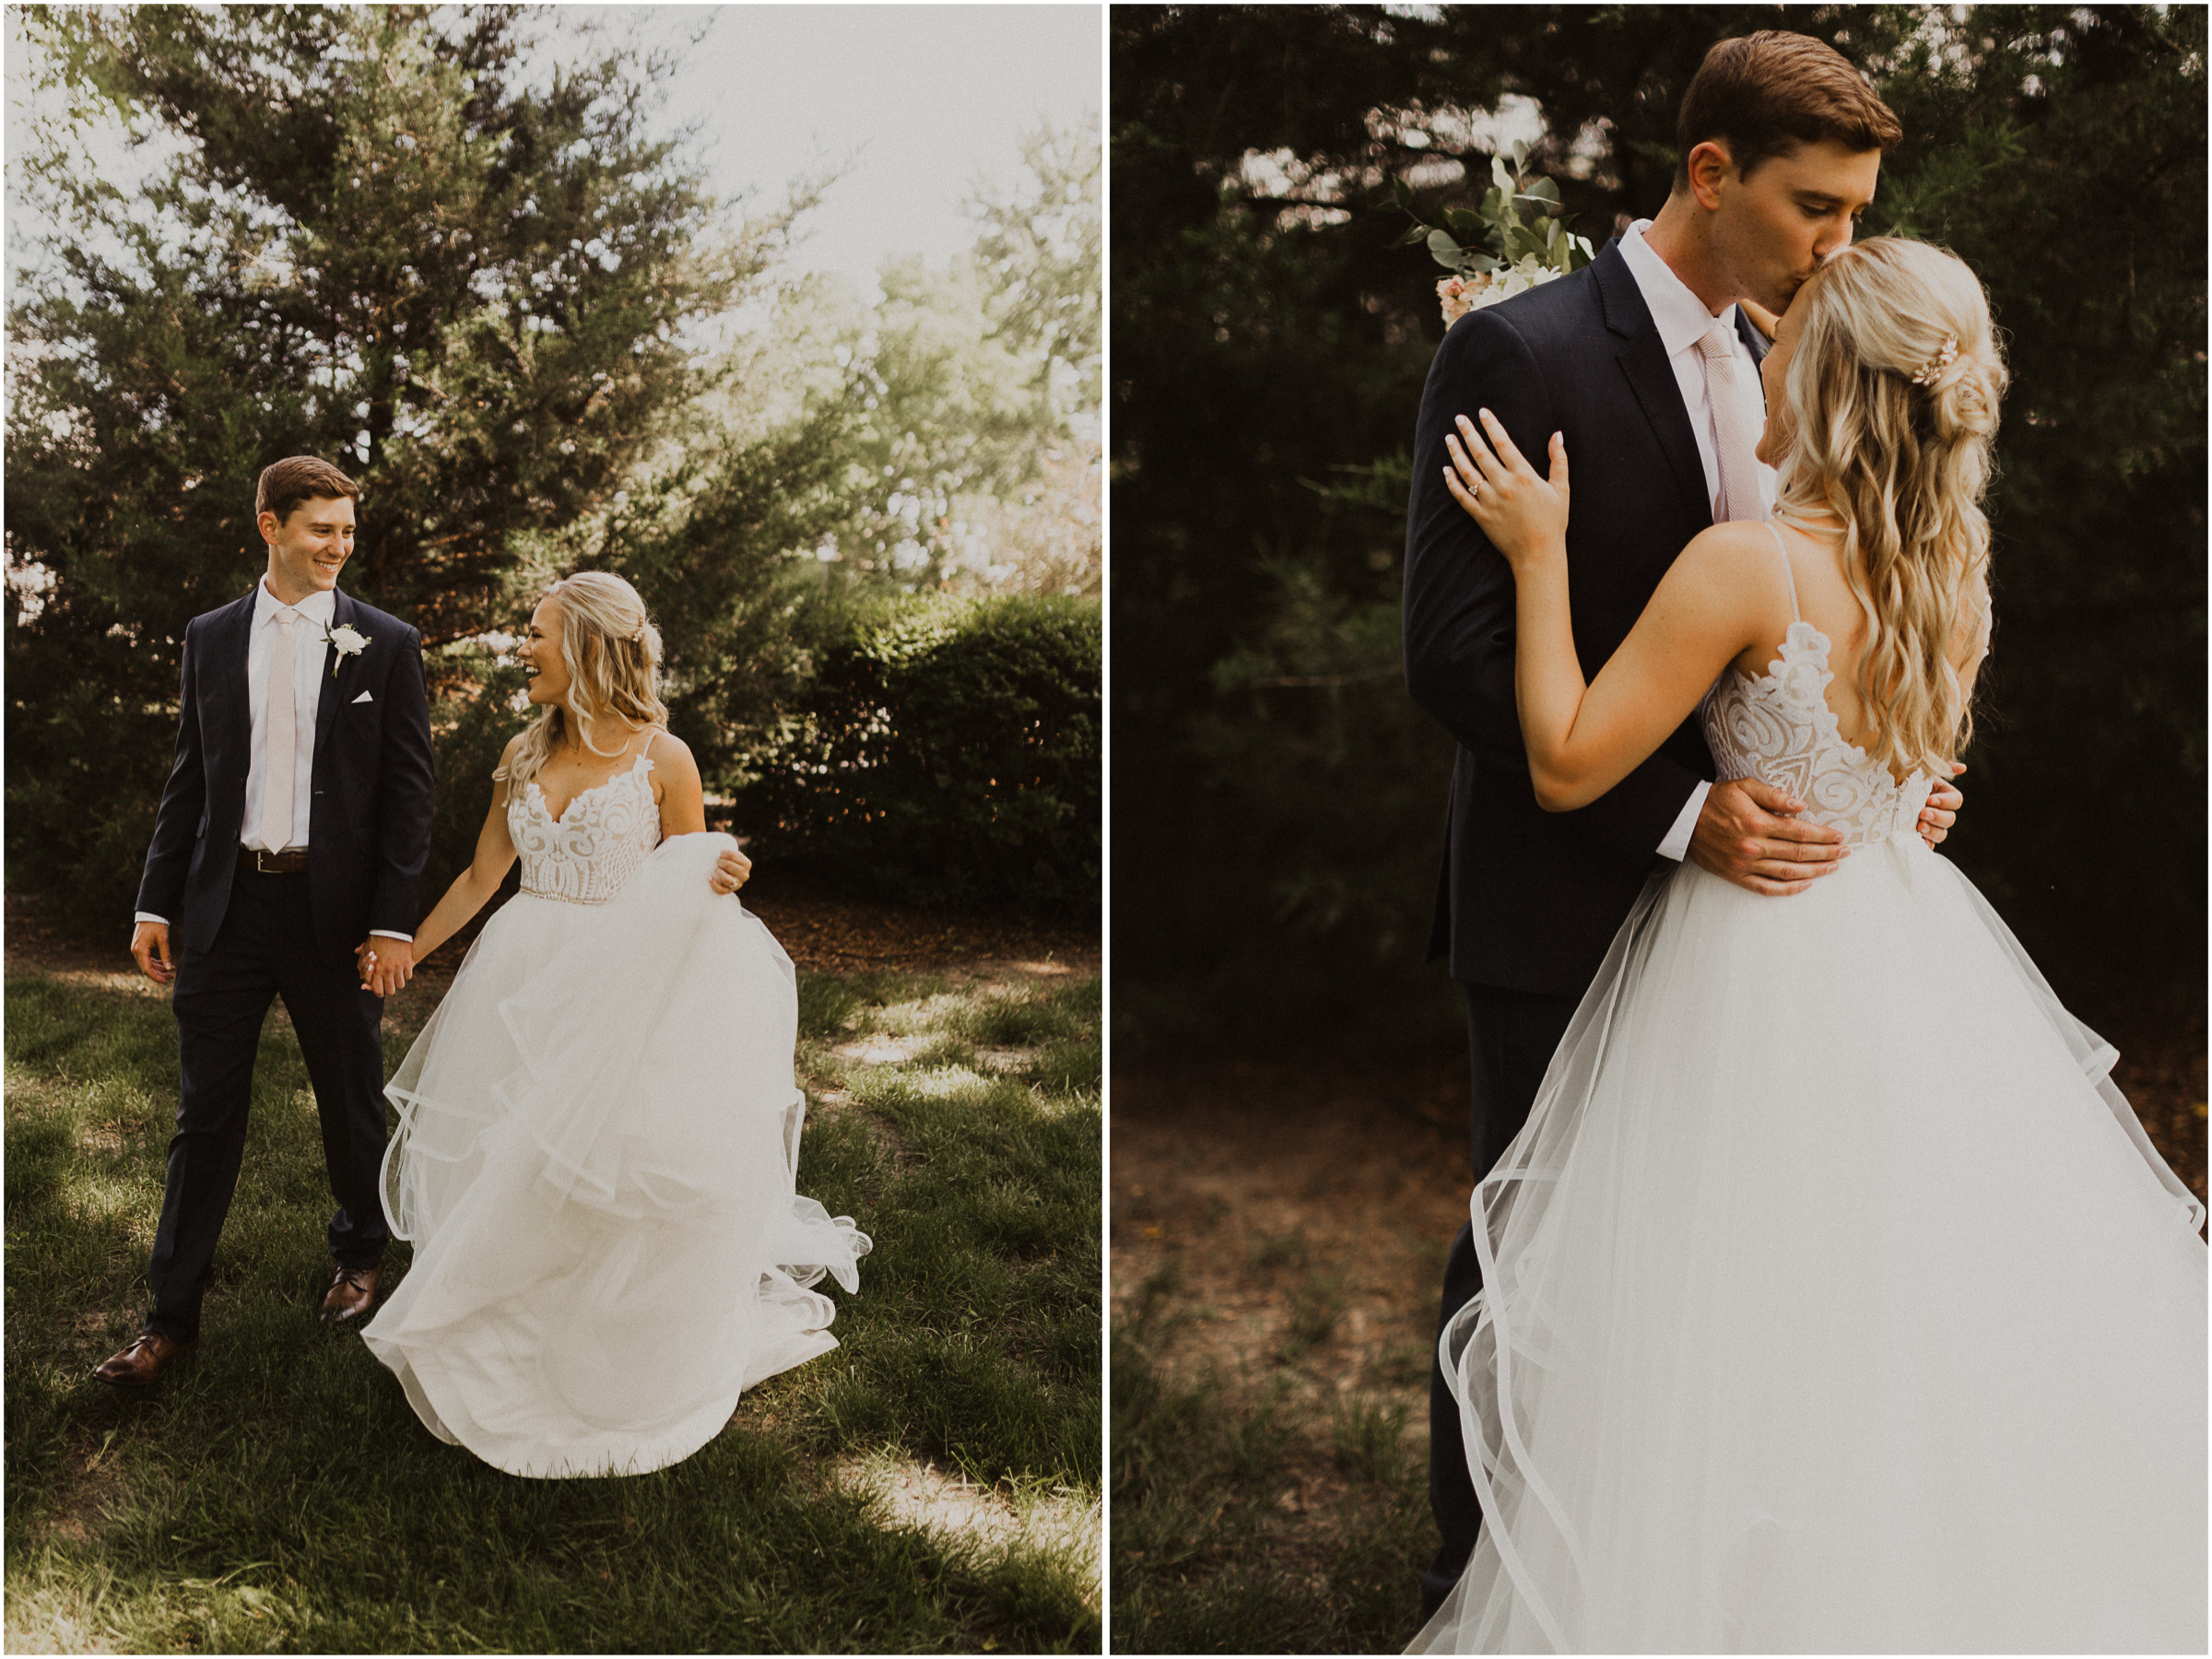 alyssa barletter photography hawthorne house summer outdoor wedding southern charm inspiration-31.jpg